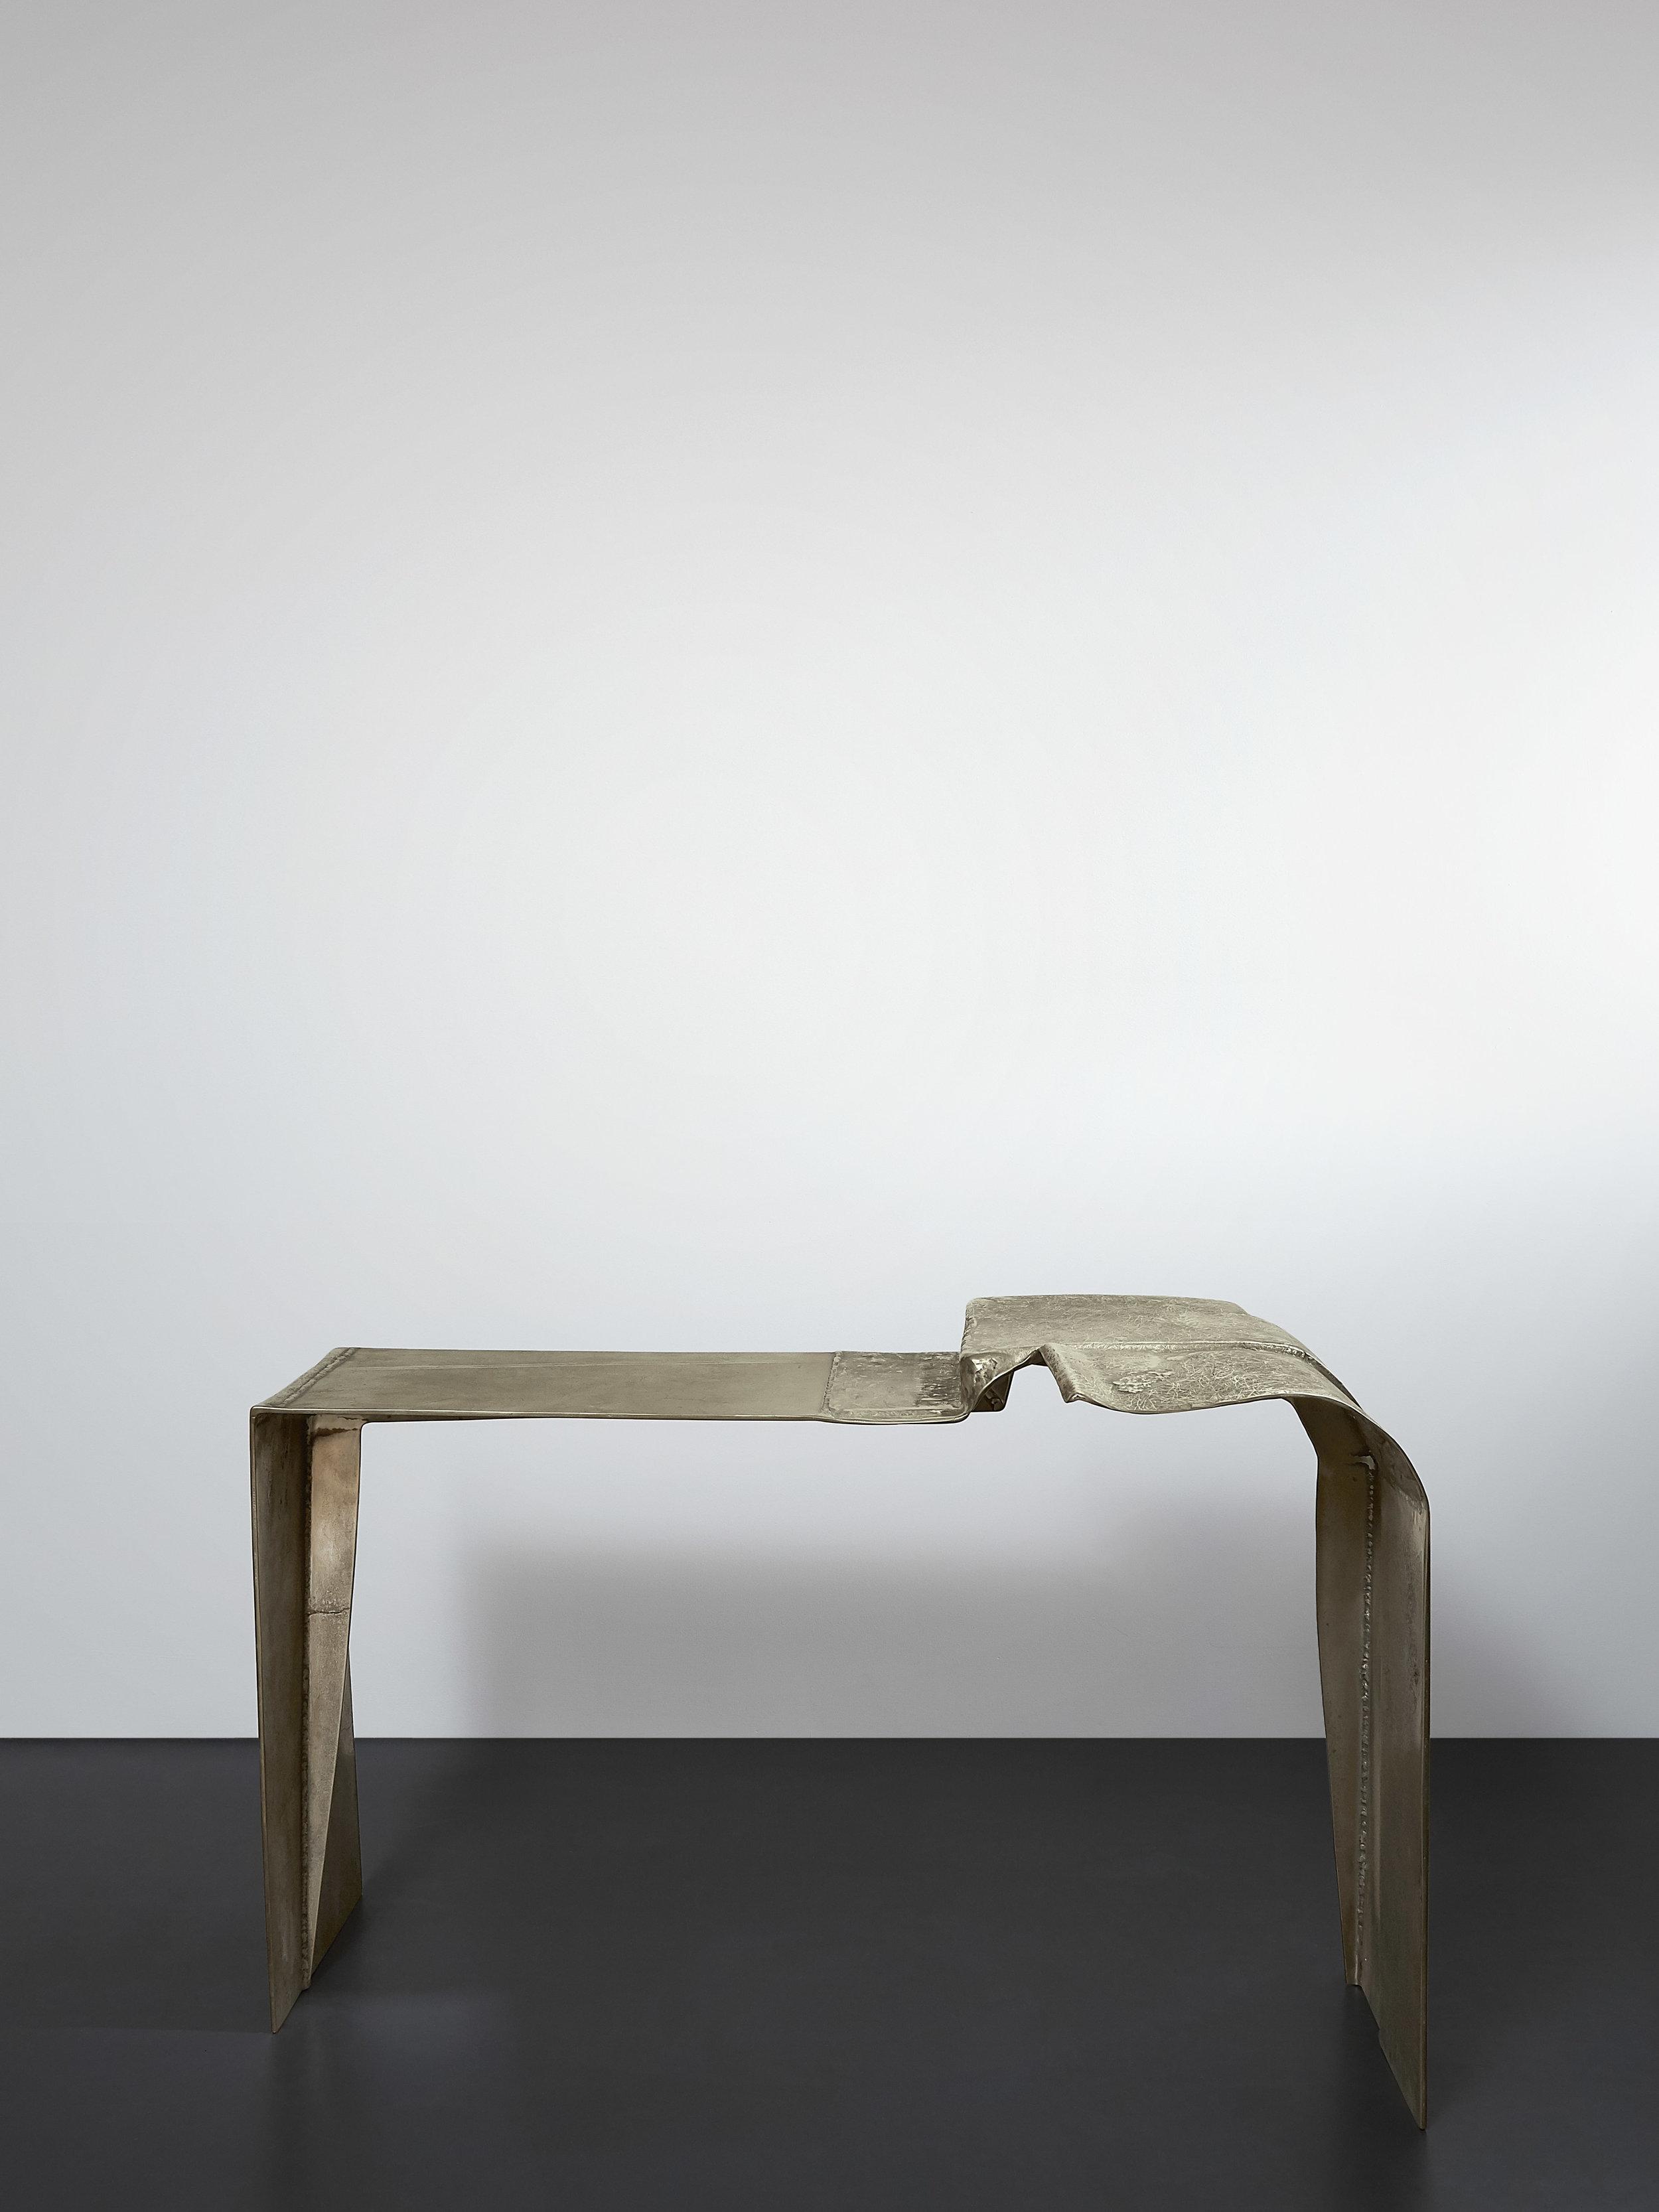 DC1713 - cast brass desk by Vincenzo de Cotiis 2017,Photo: Courtesy Progetto Domestico//DC1713 - bureau en laiton moulé par Vincenzo de Cotiis 2017, Photo: Courtesy Progetto Domestico